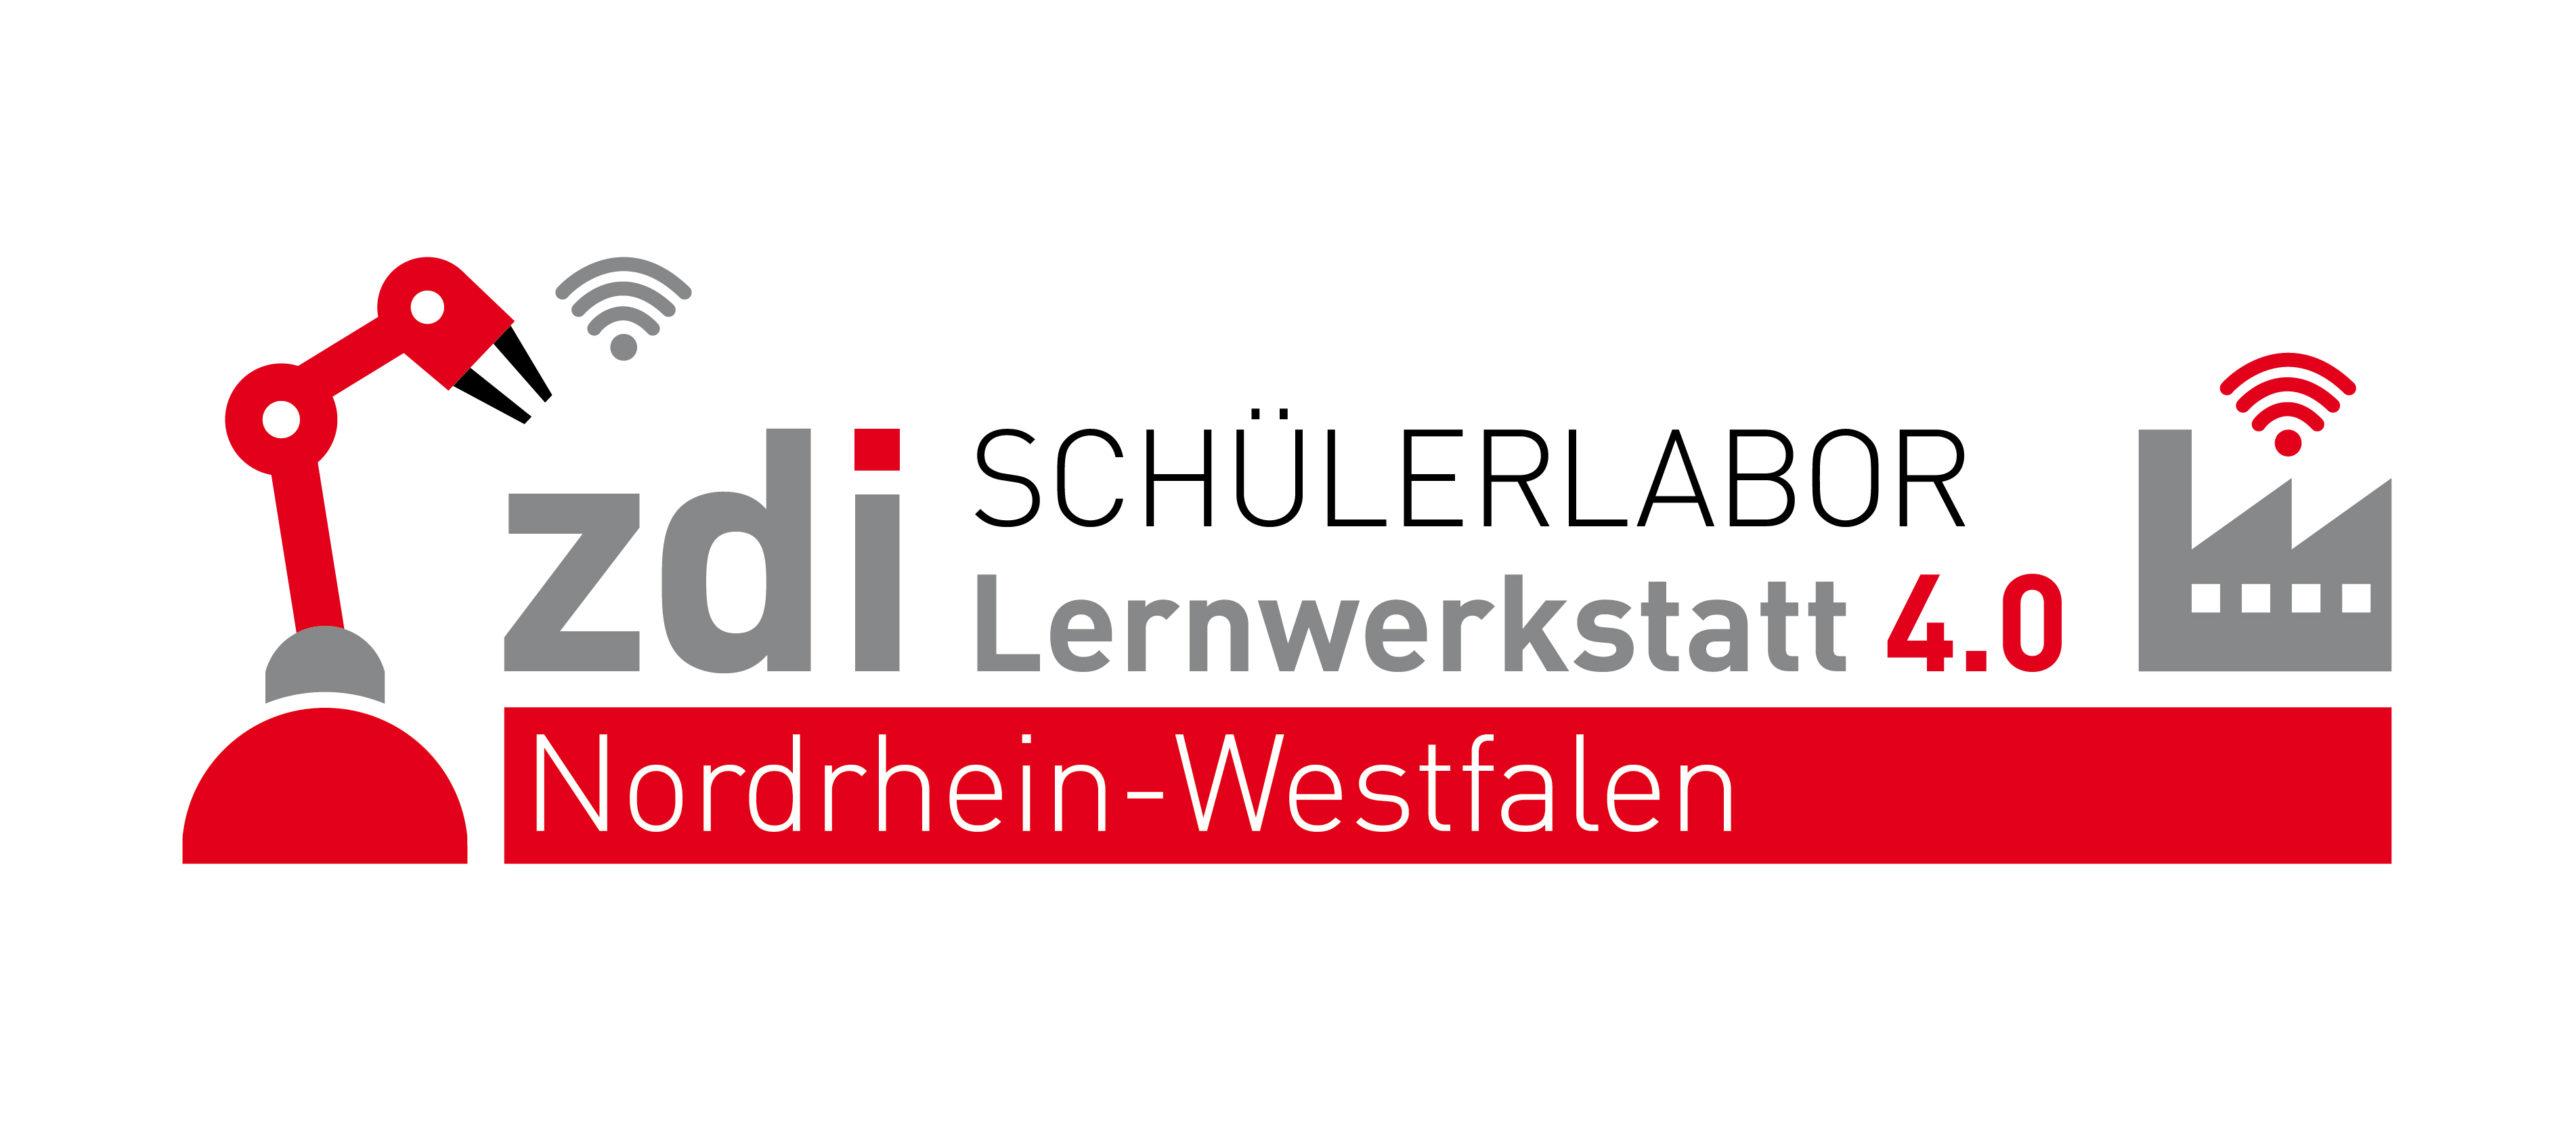 zdi-Schülerlabor Lernwerkstatt 4.0